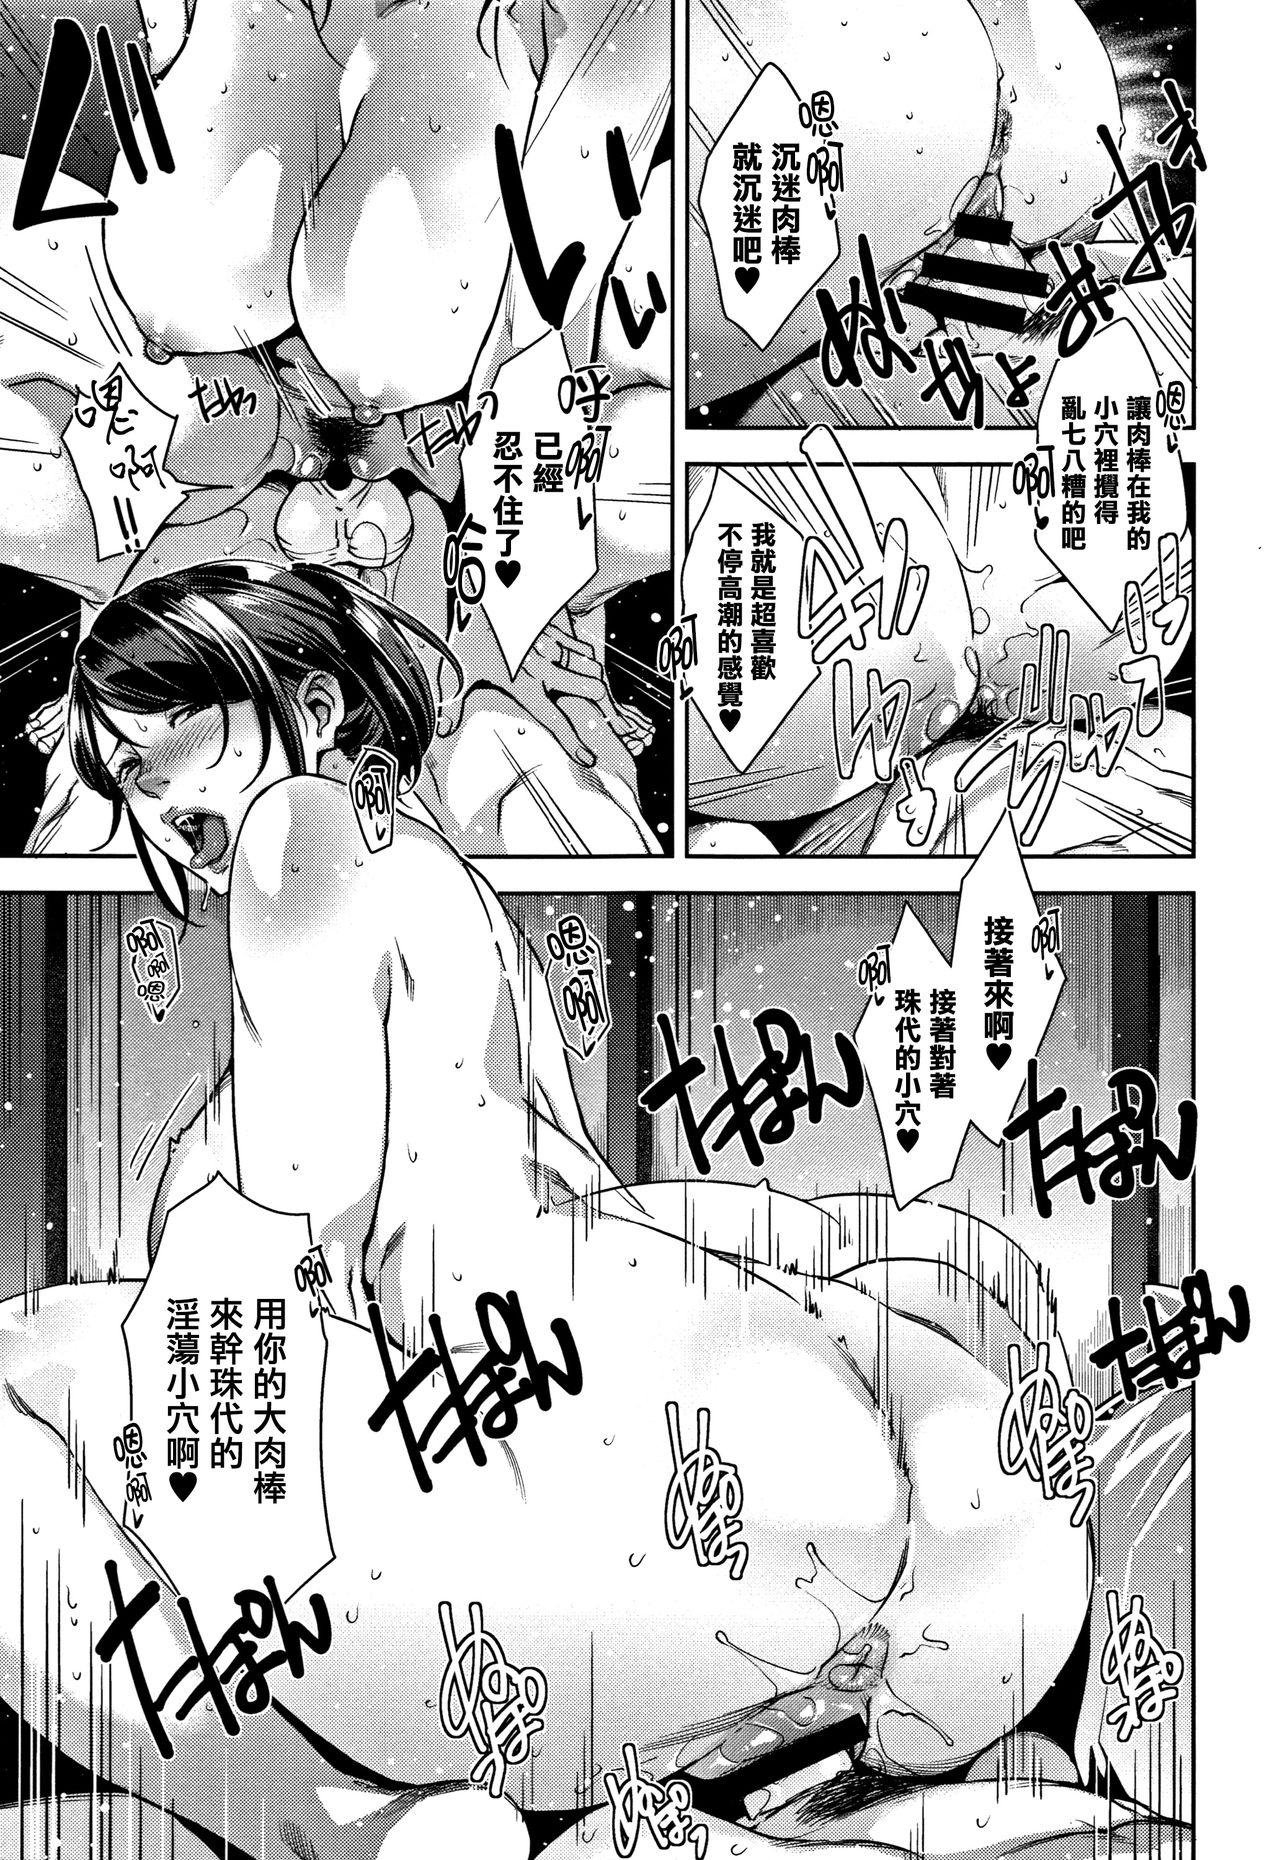 Kanjyuku Chijyo 206